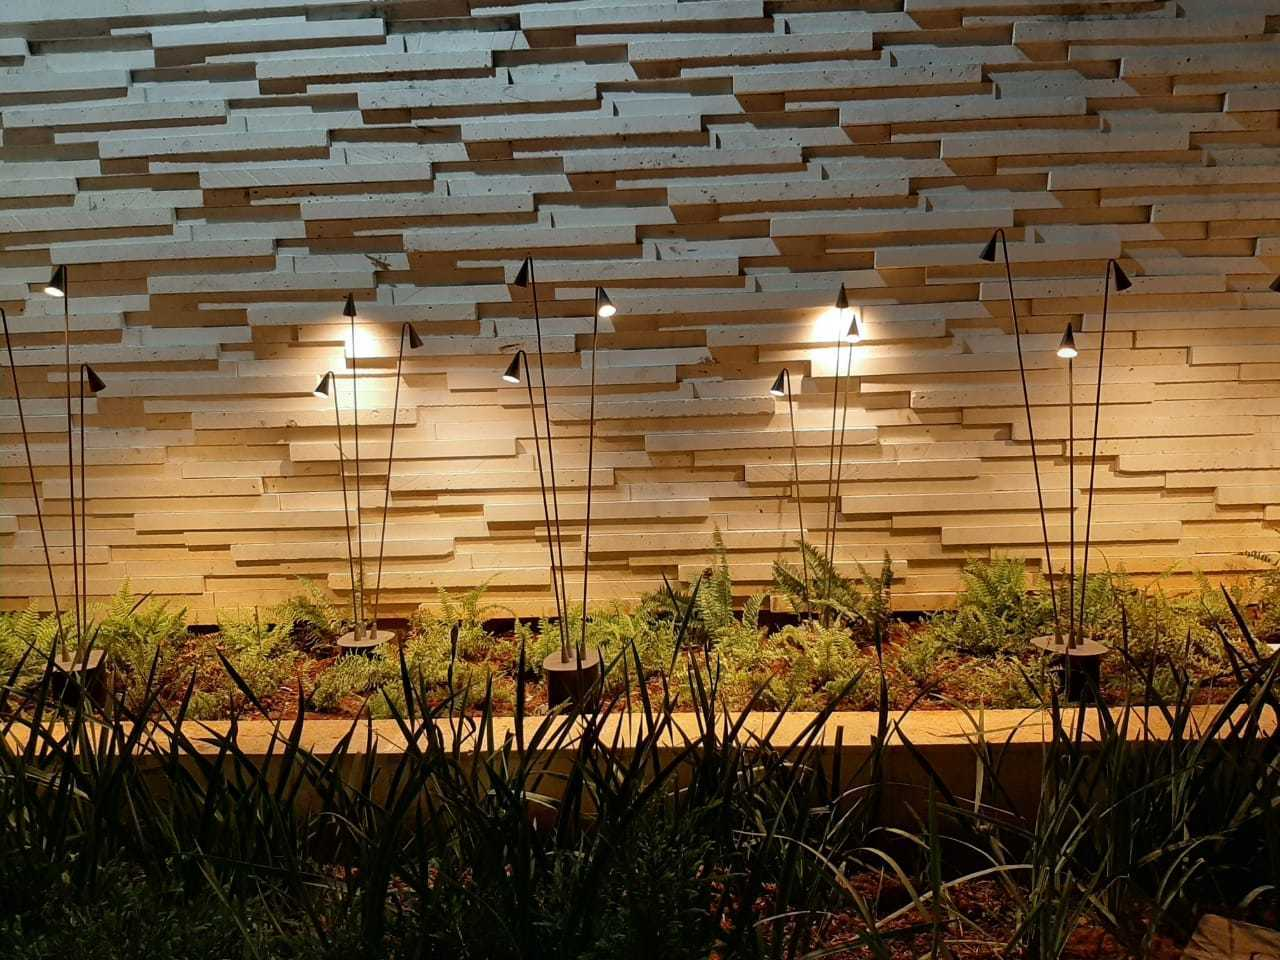 Haka Konstruksi (Personal Portfolio) Verde Two Apartment Kuningan, Karet Kuningan, Setia Budi, Kota Jakarta Selatan, Daerah Khusus Ibukota Jakarta, Indonesia Kuningan, Karet Kuningan, Setia Budi, Kota Jakarta Selatan, Daerah Khusus Ibukota Jakarta, Indonesia Haka-Konstruksi-Personal-Portfolio-Verde-Two-Apartment   103501